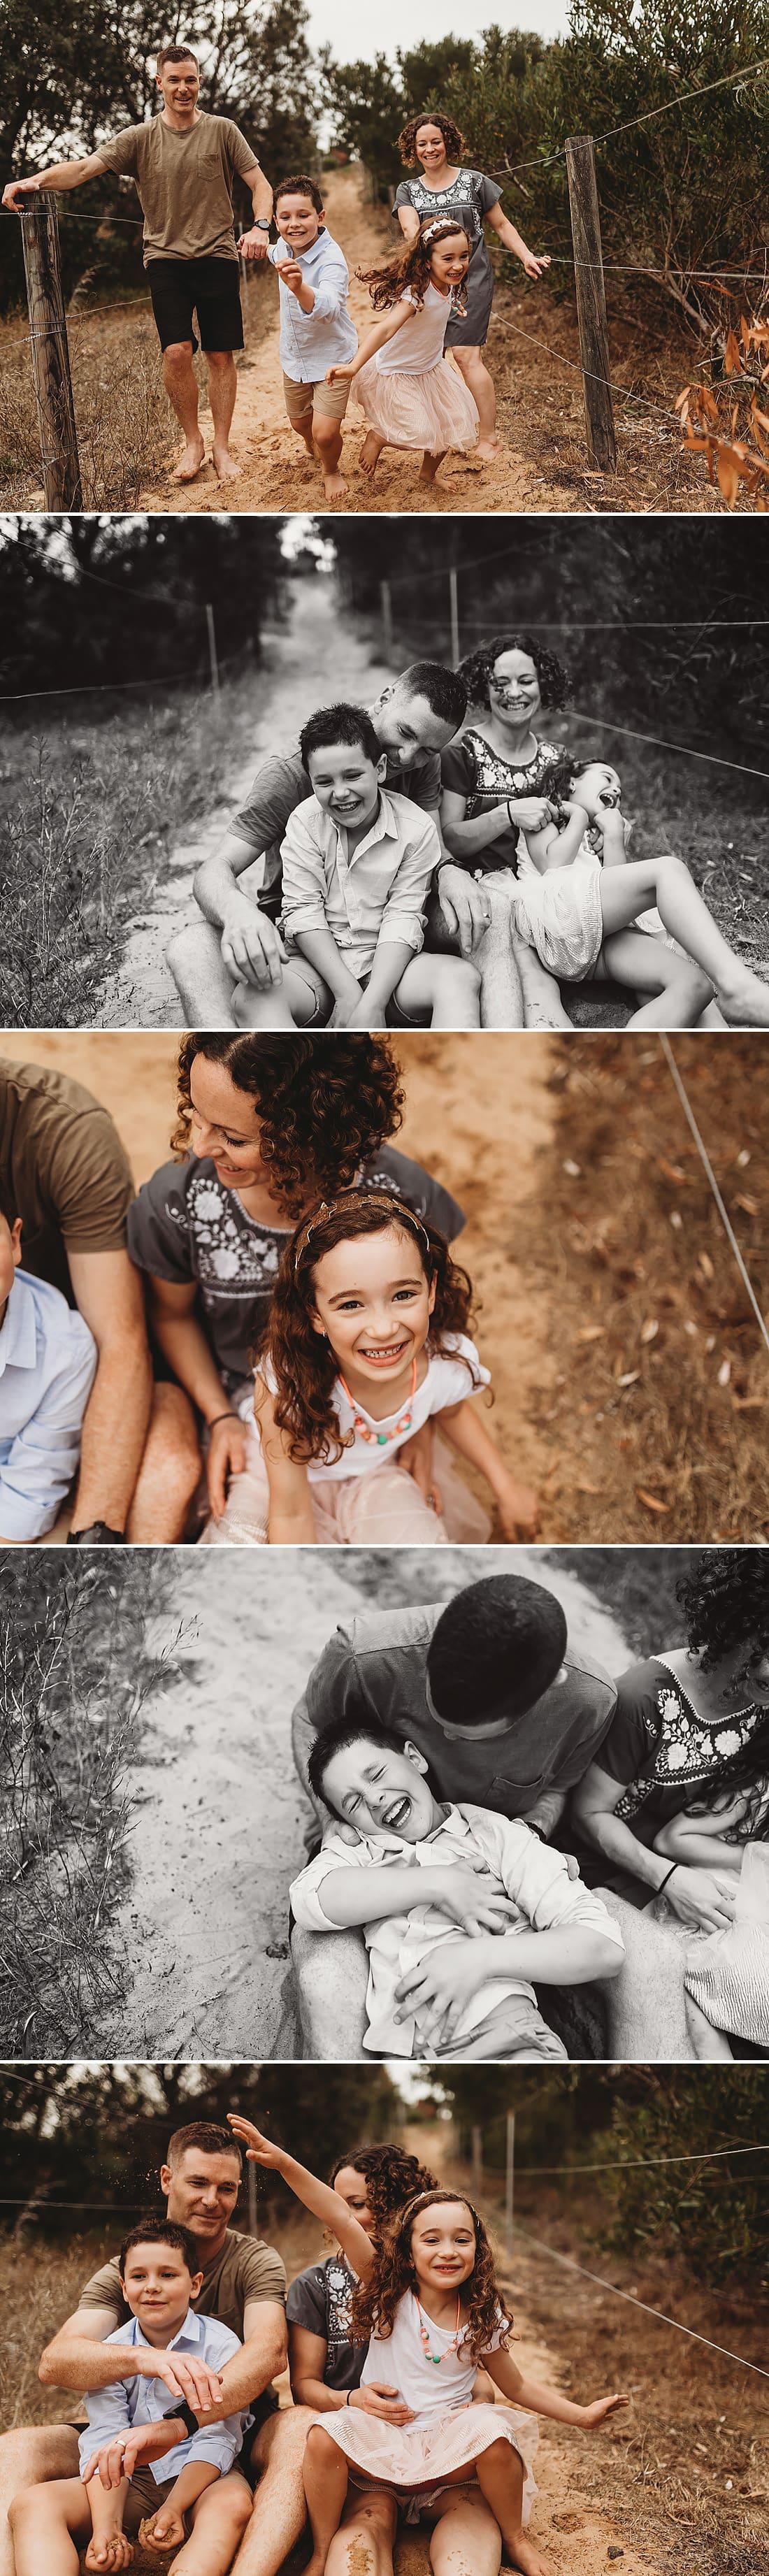 Sydney-family-photography-sutherland-shire